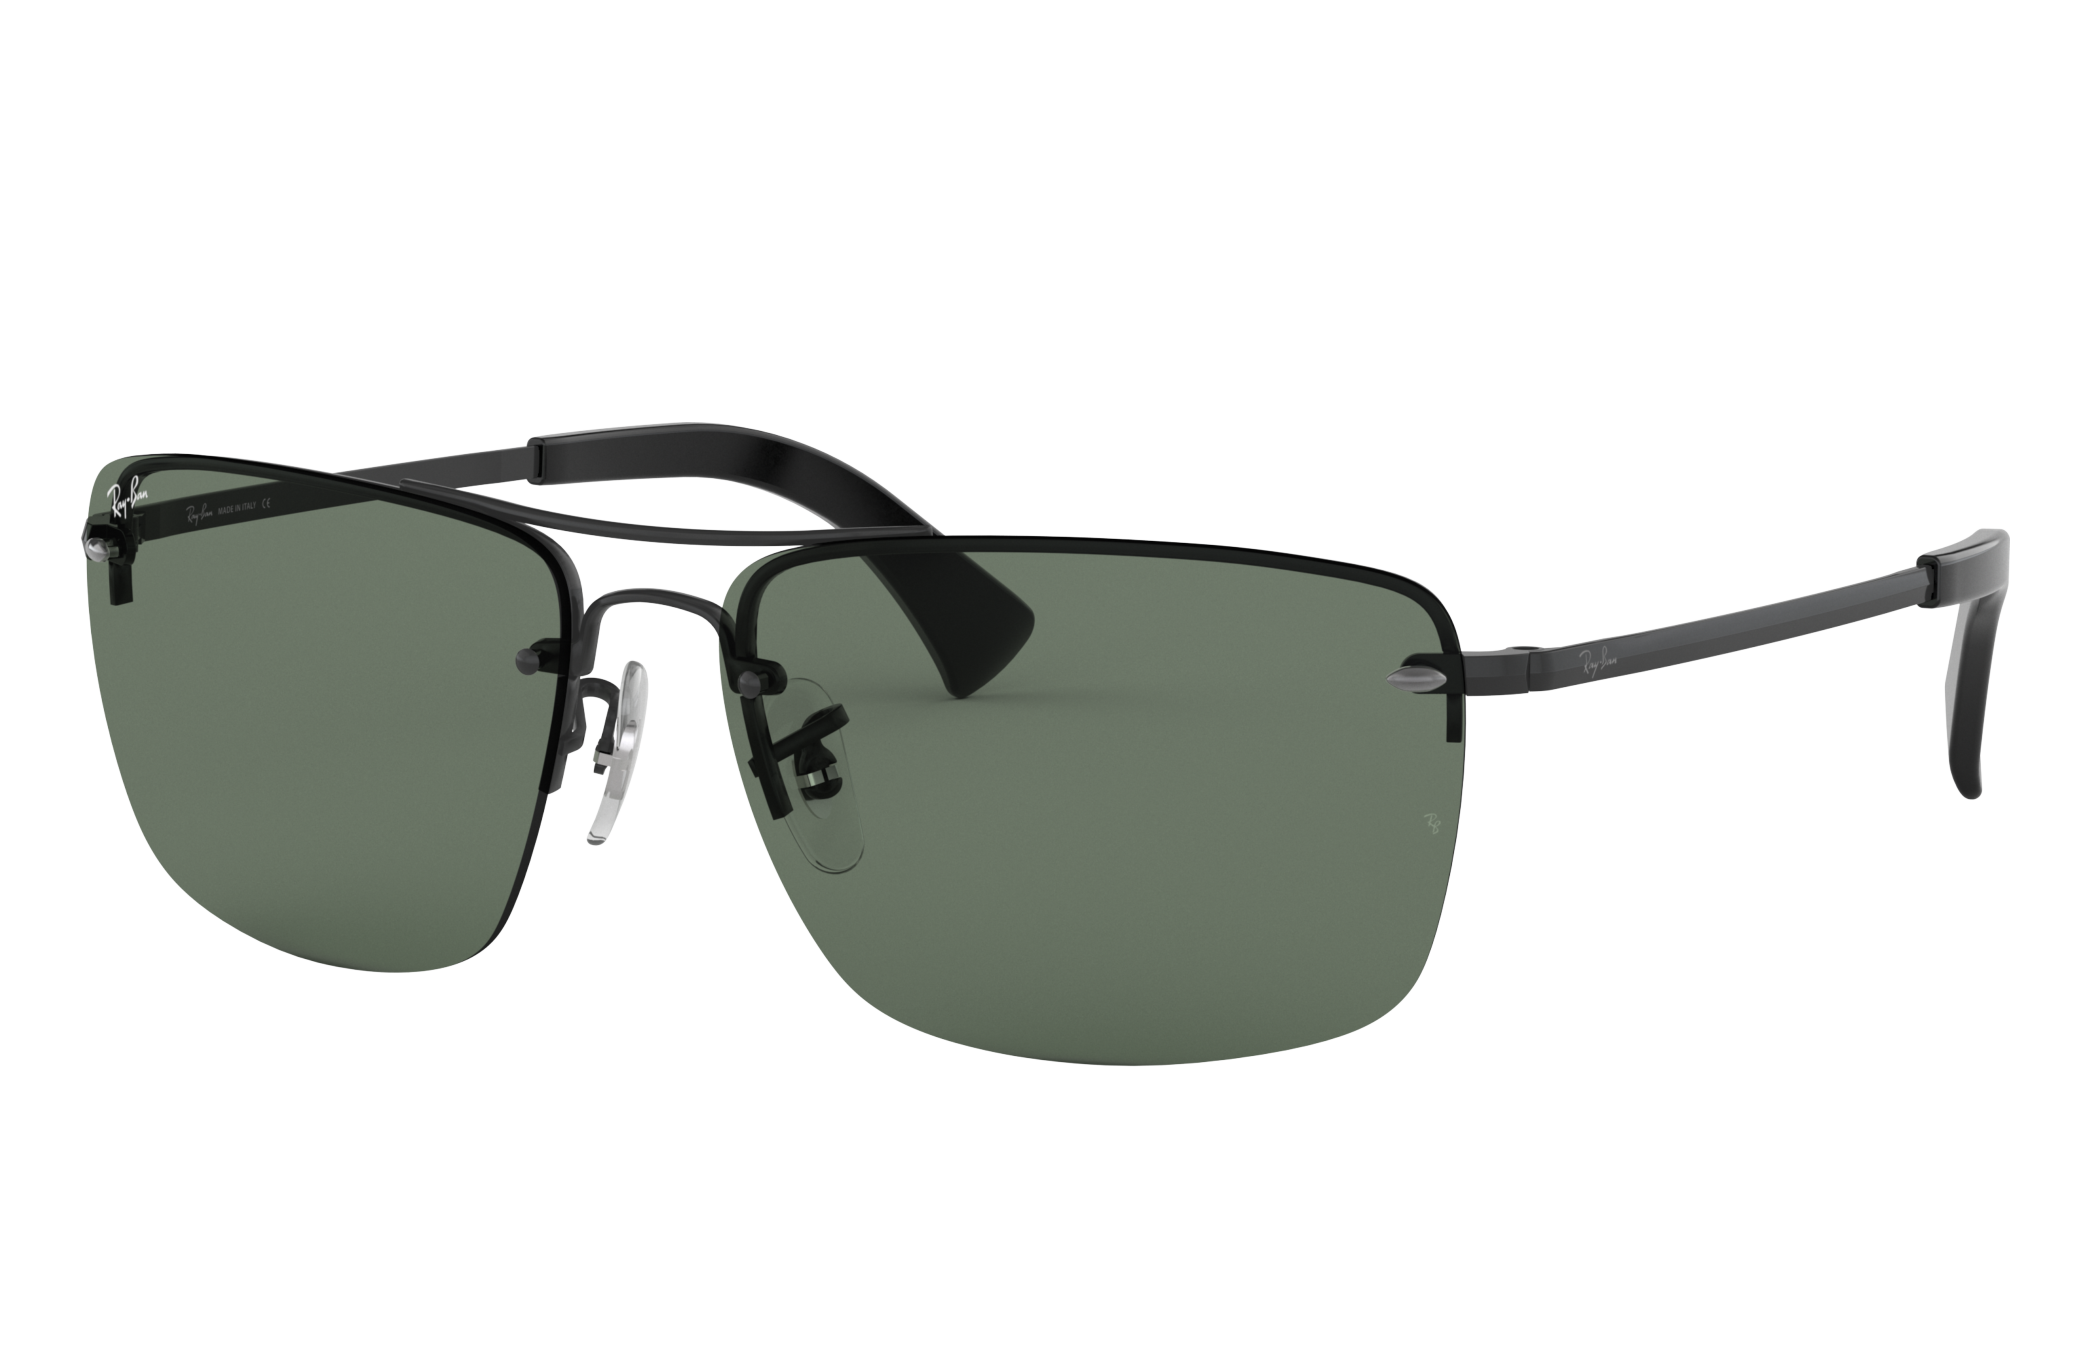 Ray-Ban Rb3607 Black, Green Lenses - RB3607